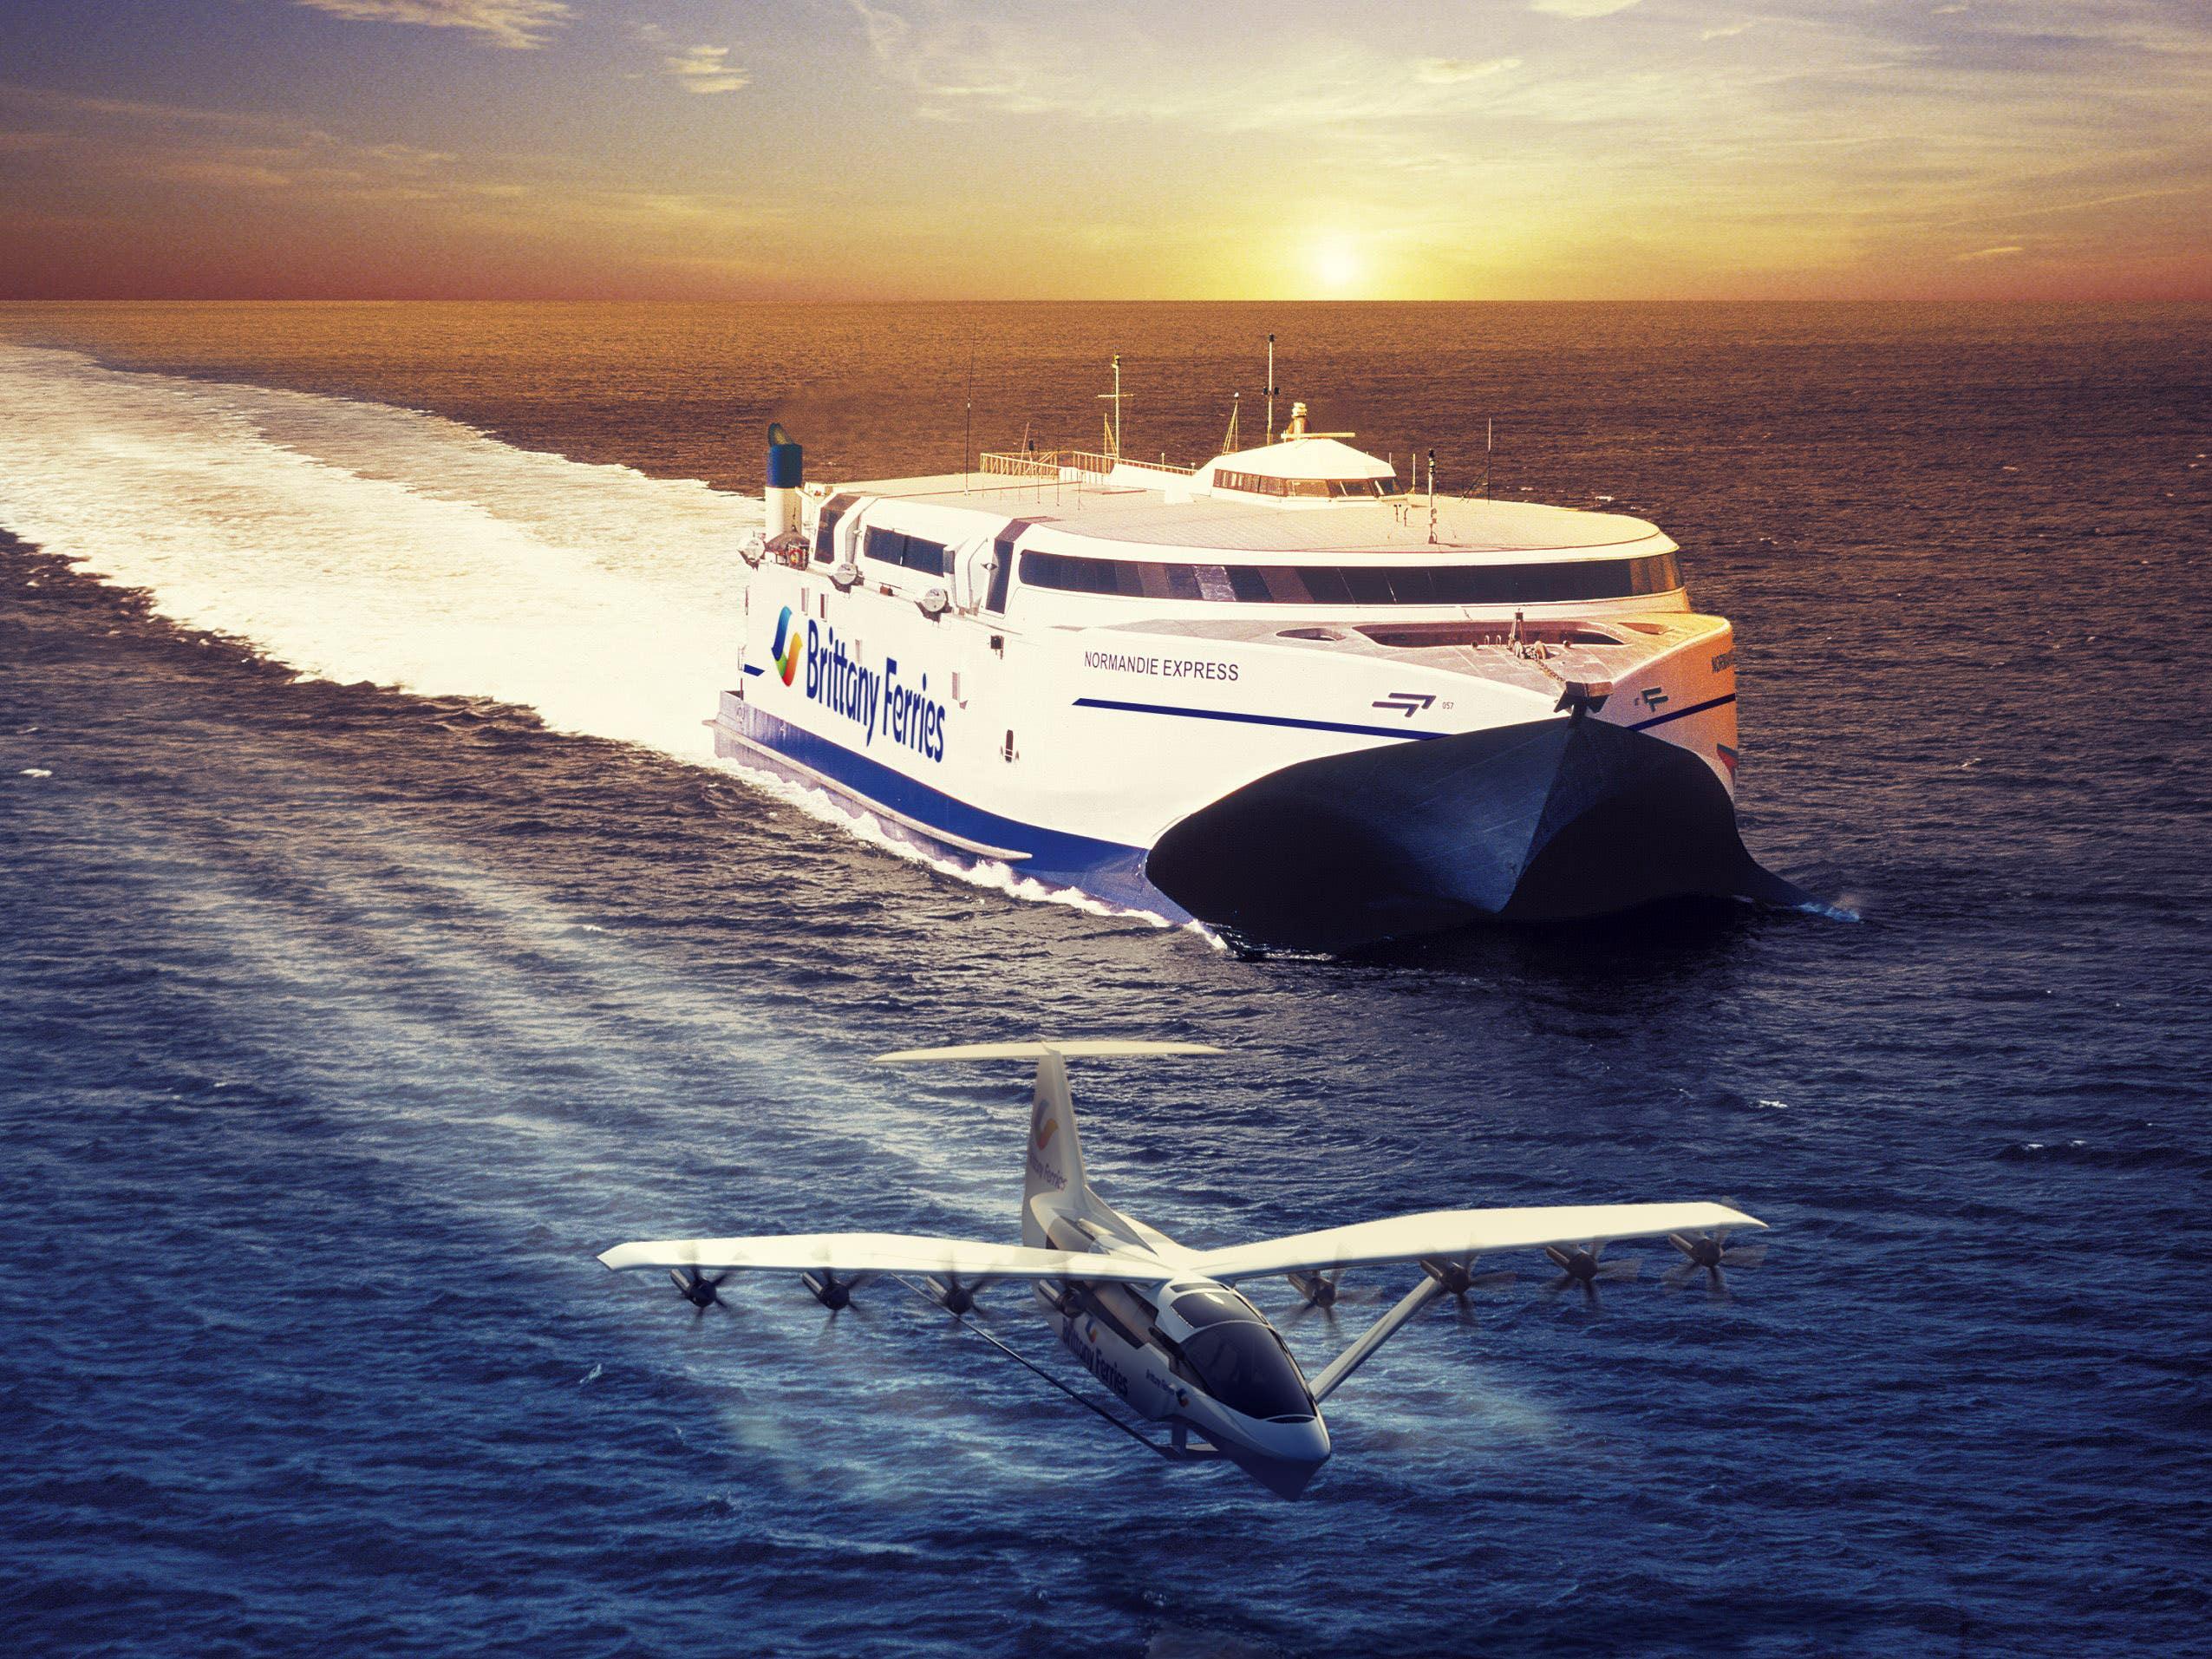 An artist's impression of a seaglider alongside a catamaran